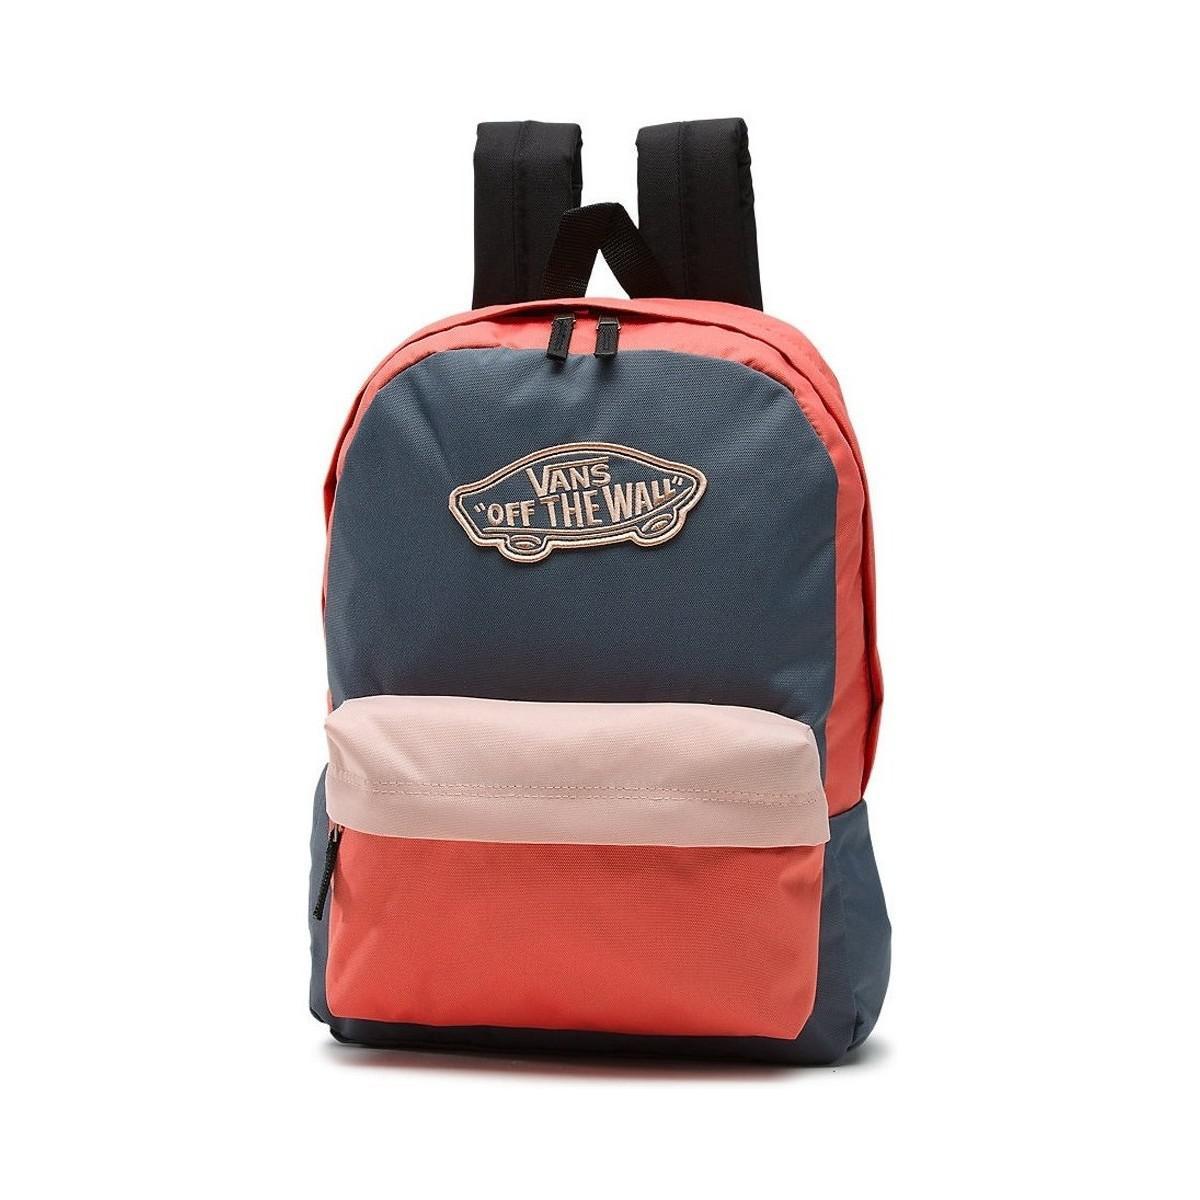 Vans Realm Backpack Men s Backpack In Multicolour for Men - Lyst d5c0d9deef